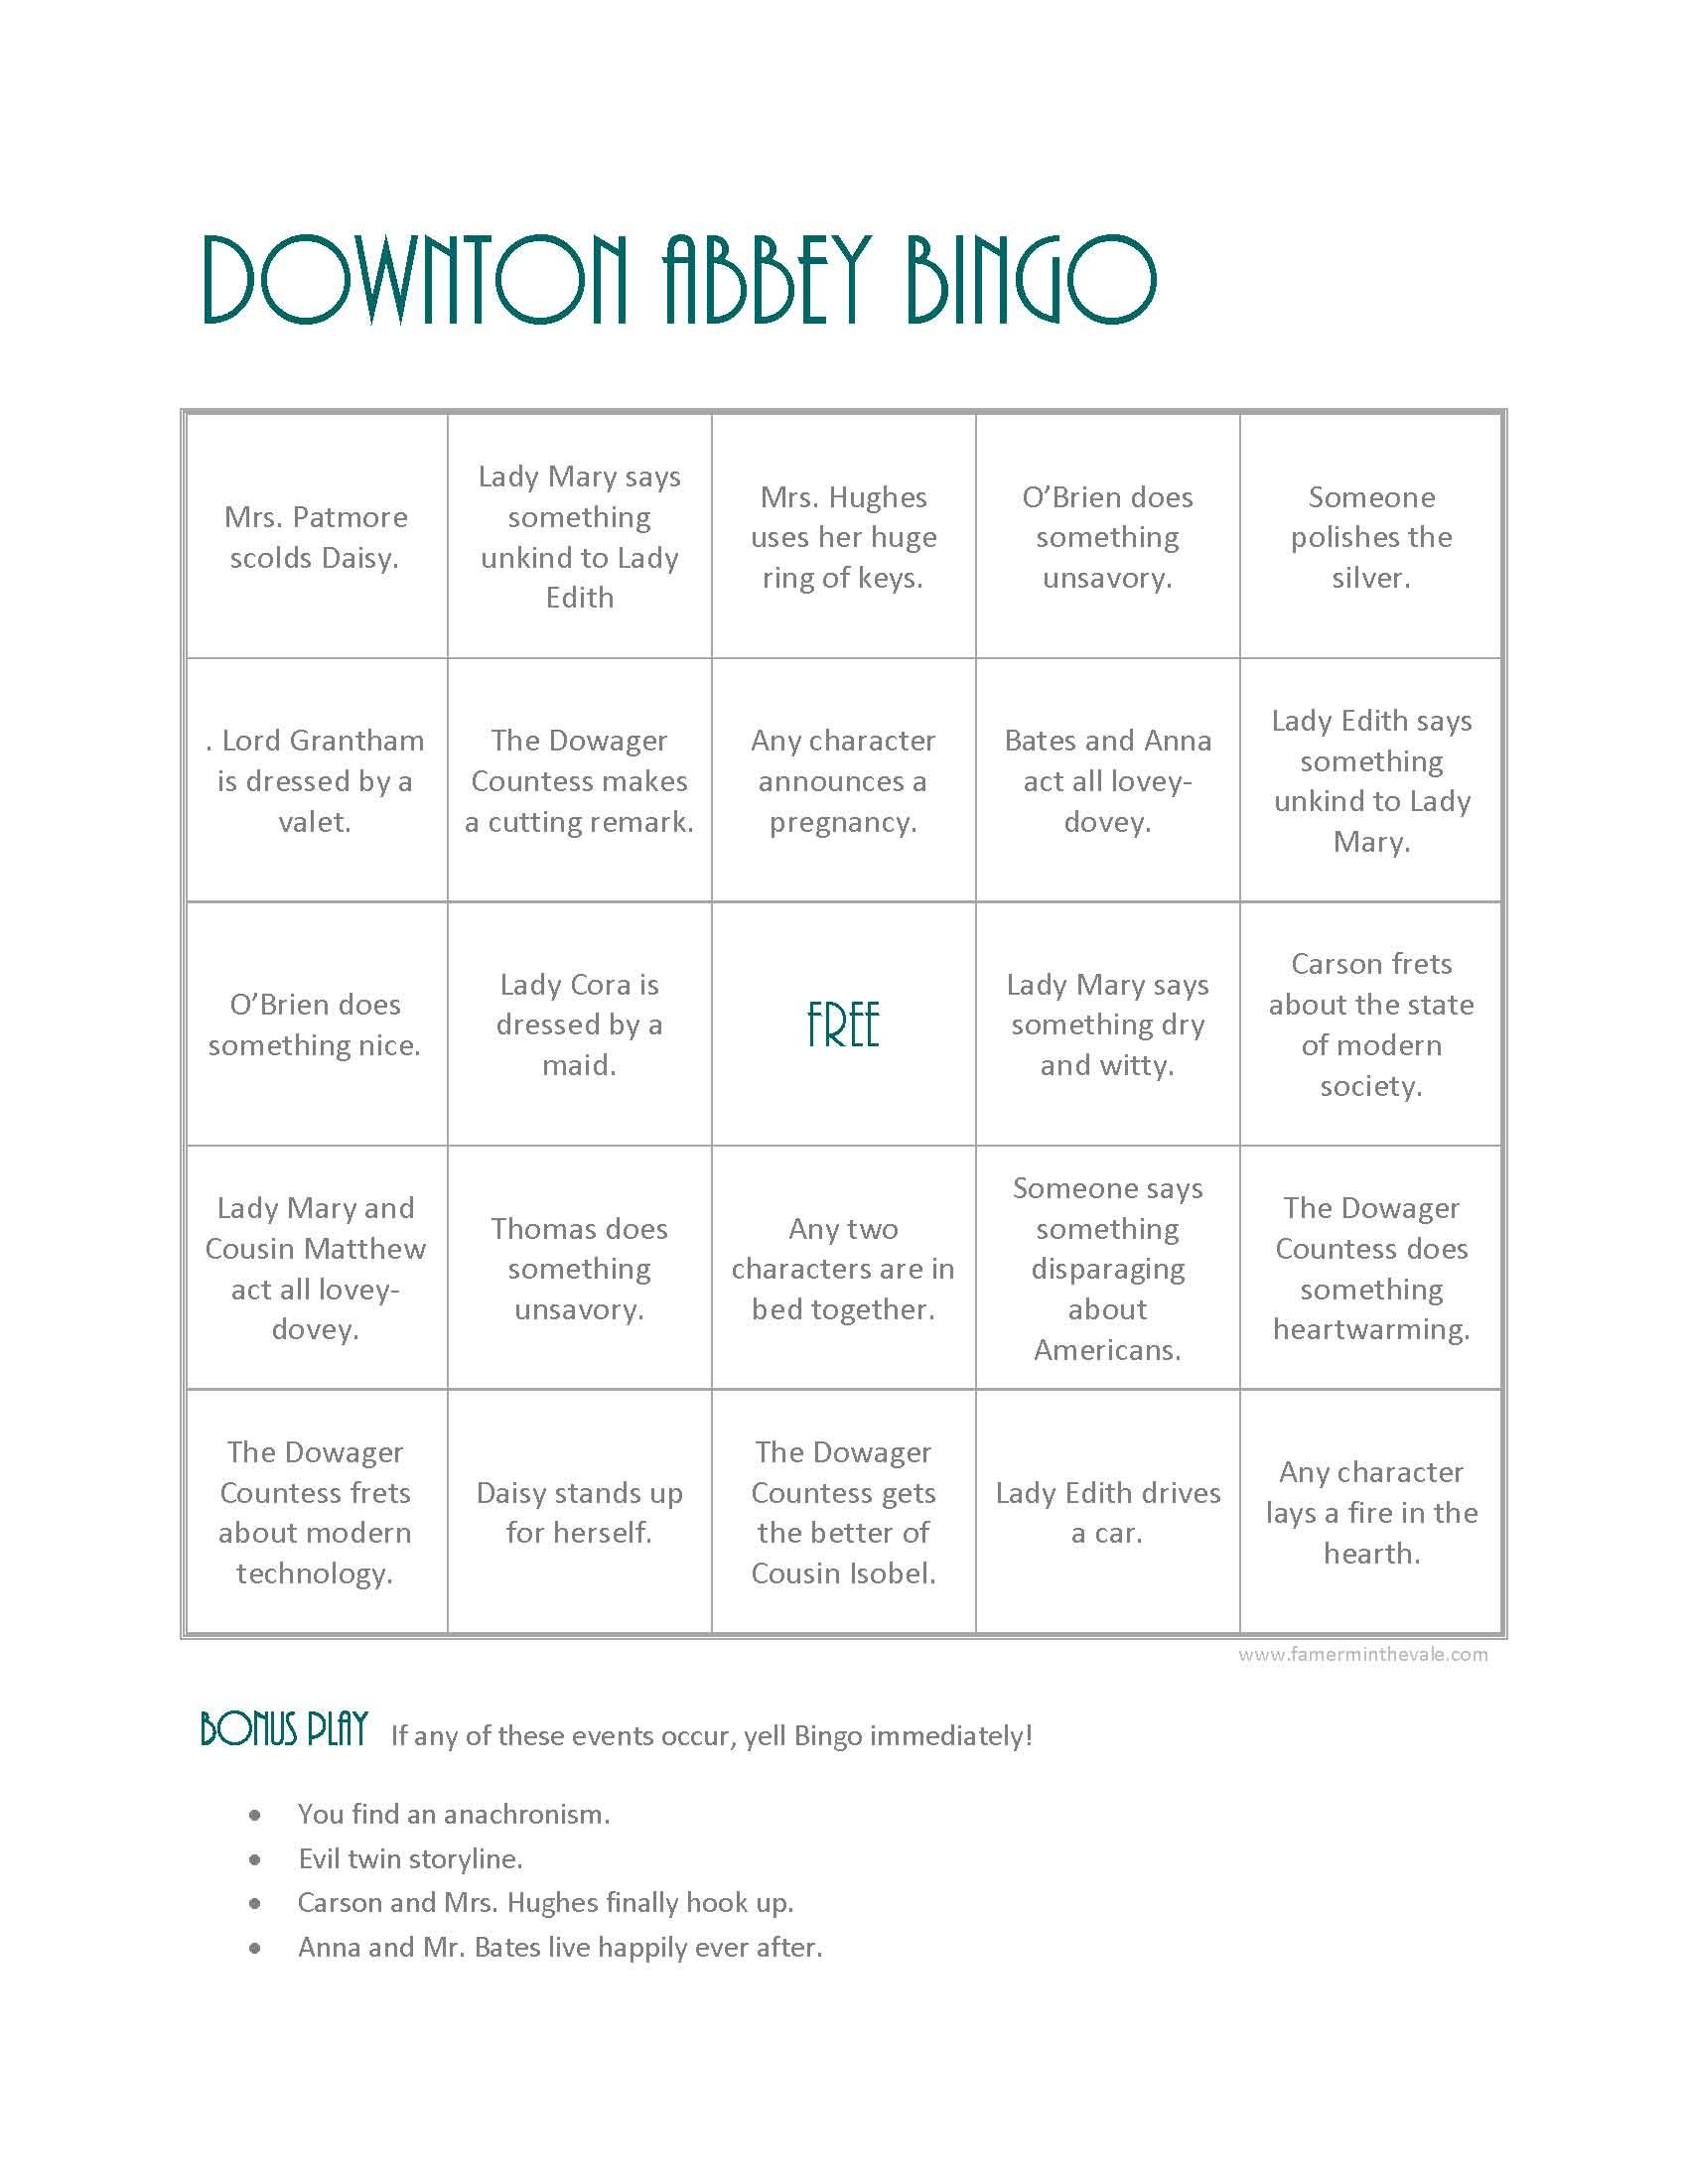 Downton Bingo from farmerinthevale